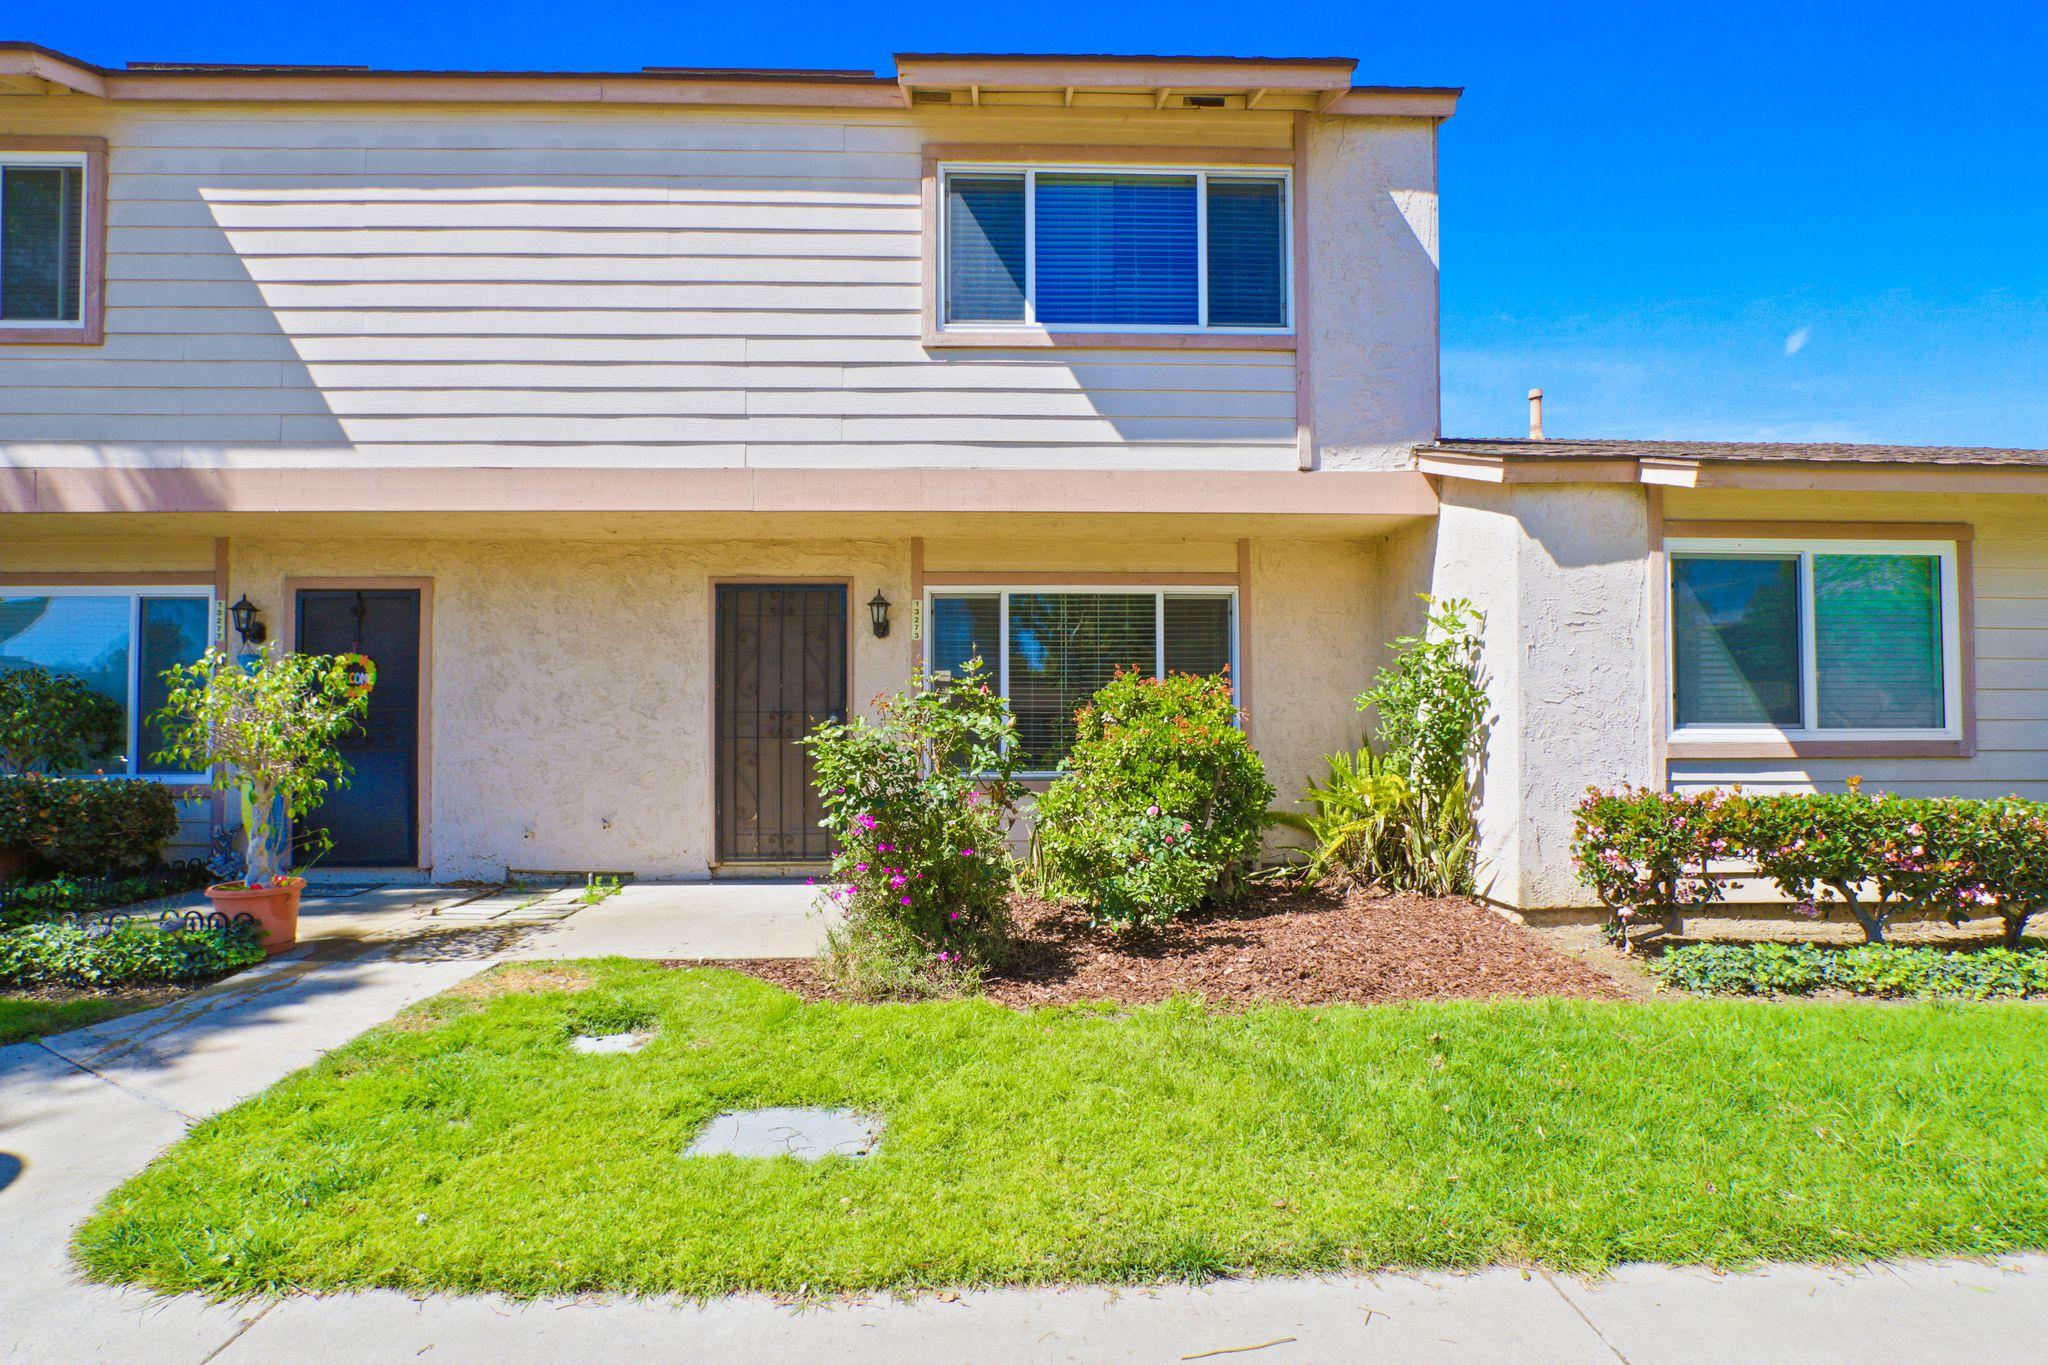 13273 Woodbrook Cir, Garden Grove, CA 92844 - Estimate and Home ...